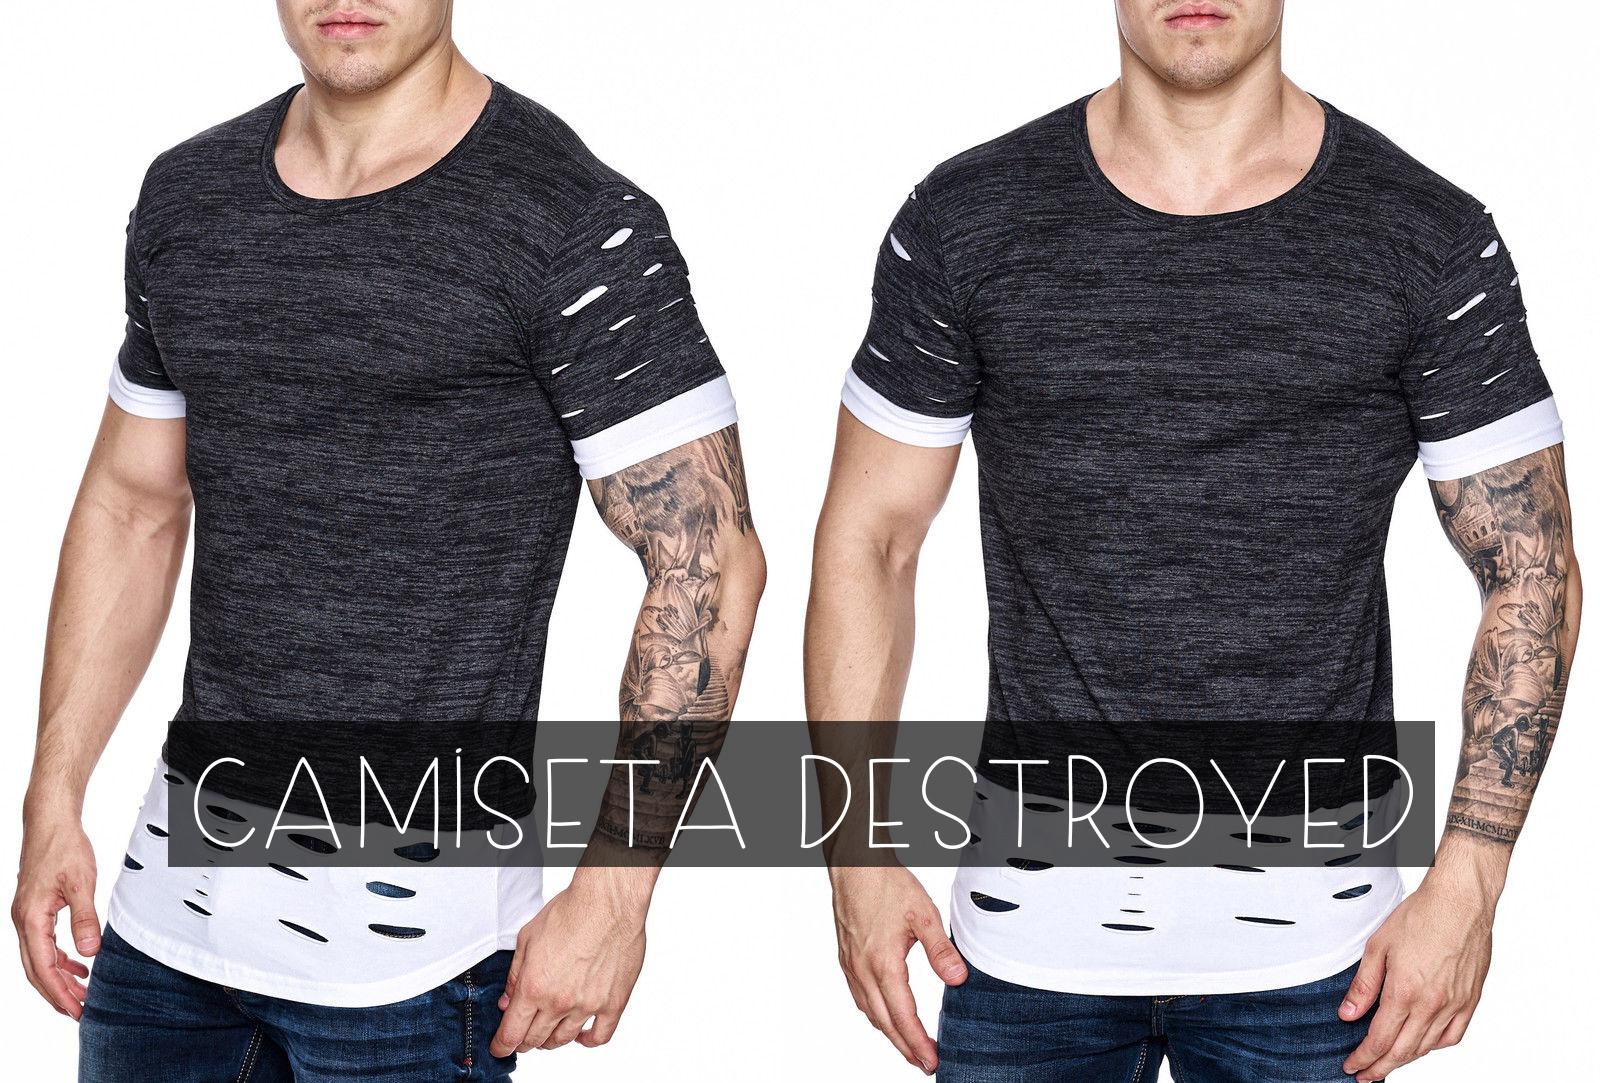 Camiseta Destroyed  Vista-se com estilo e atitude - Marco da Moda e612da8258a